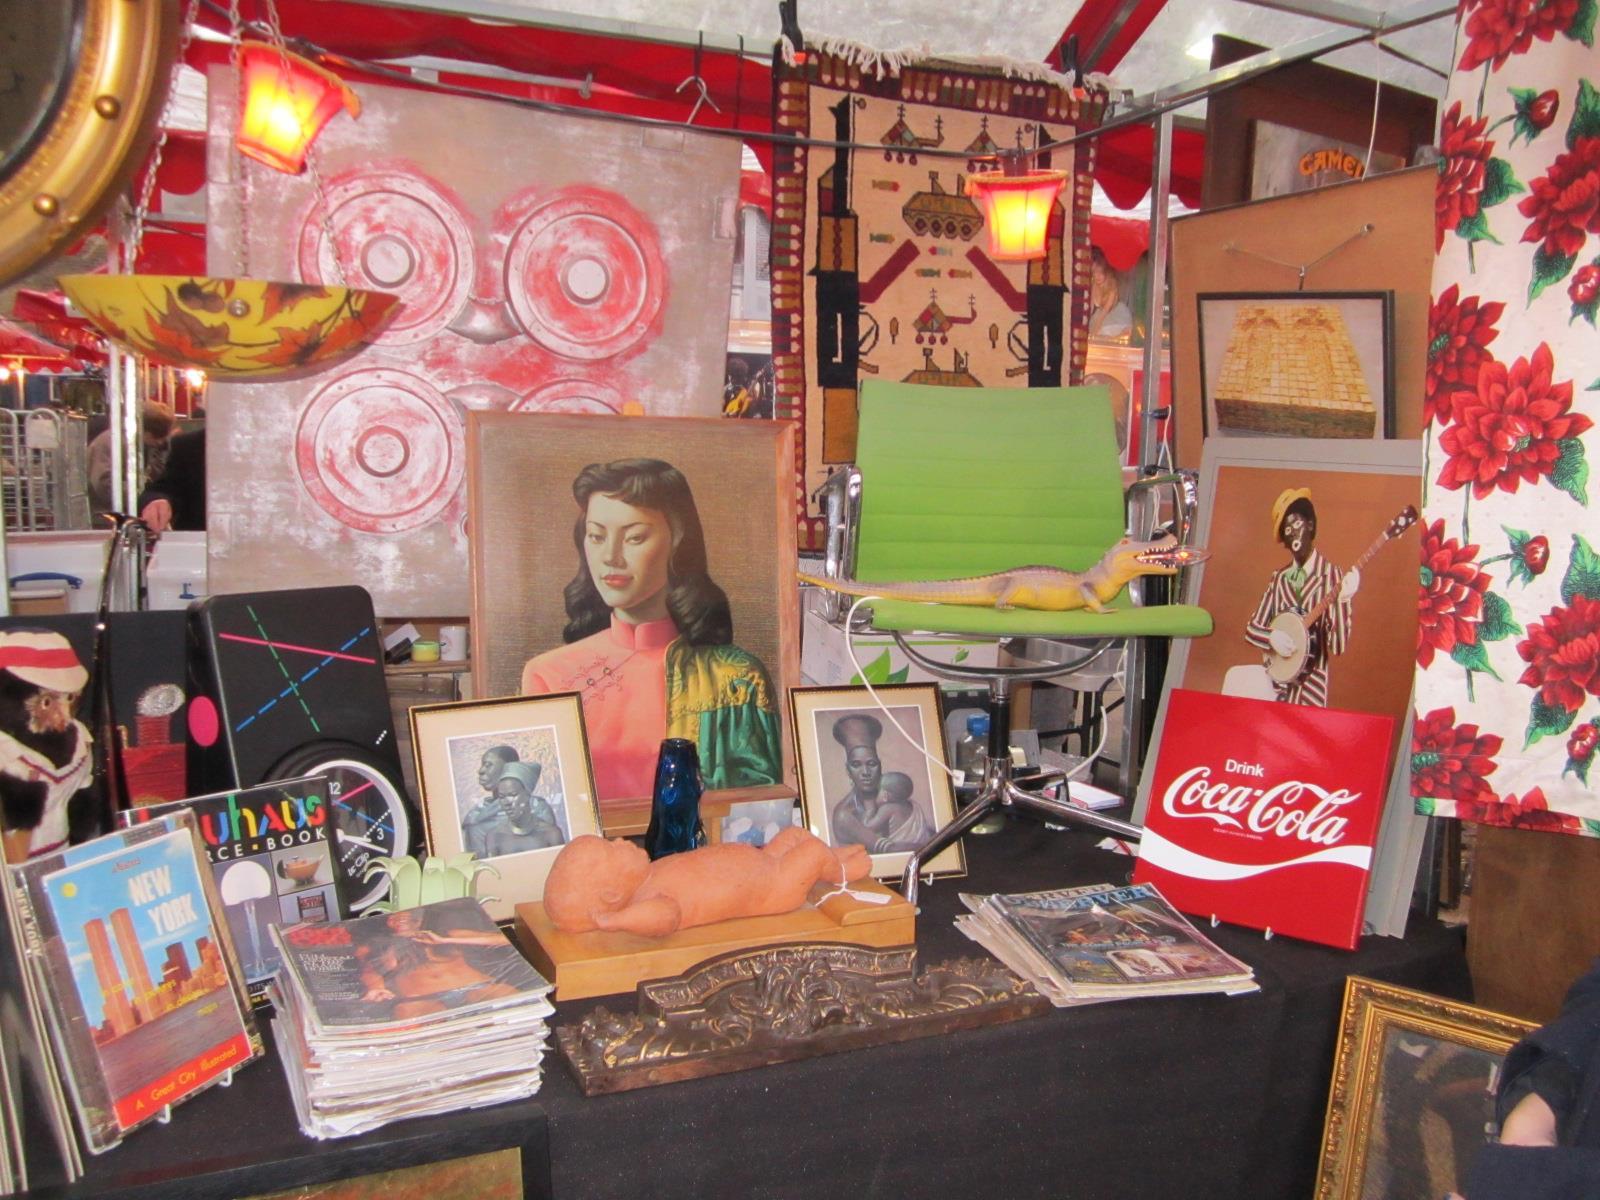 Old spitalfields antique and flea marketi love markets for Antique fairs and flea markets 2016